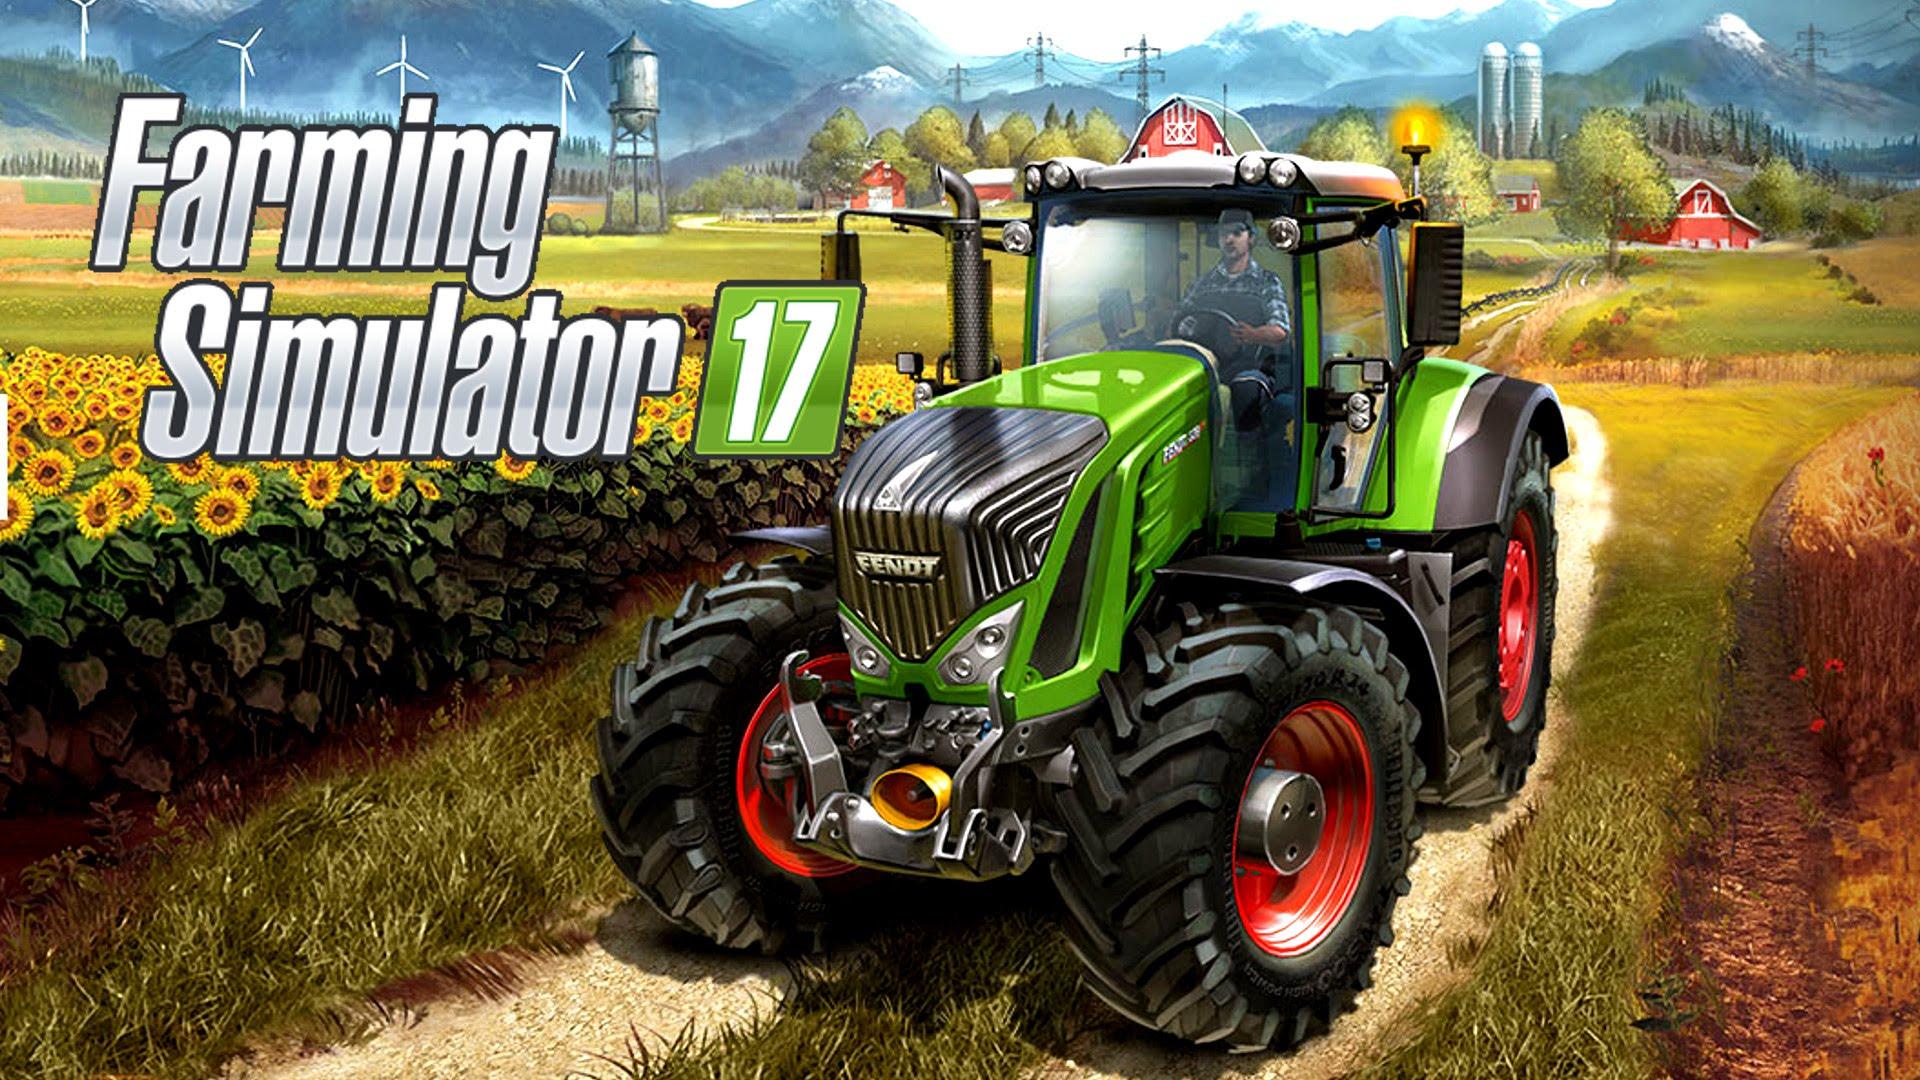 Farming Simulator 17 - Farming Simulator 17